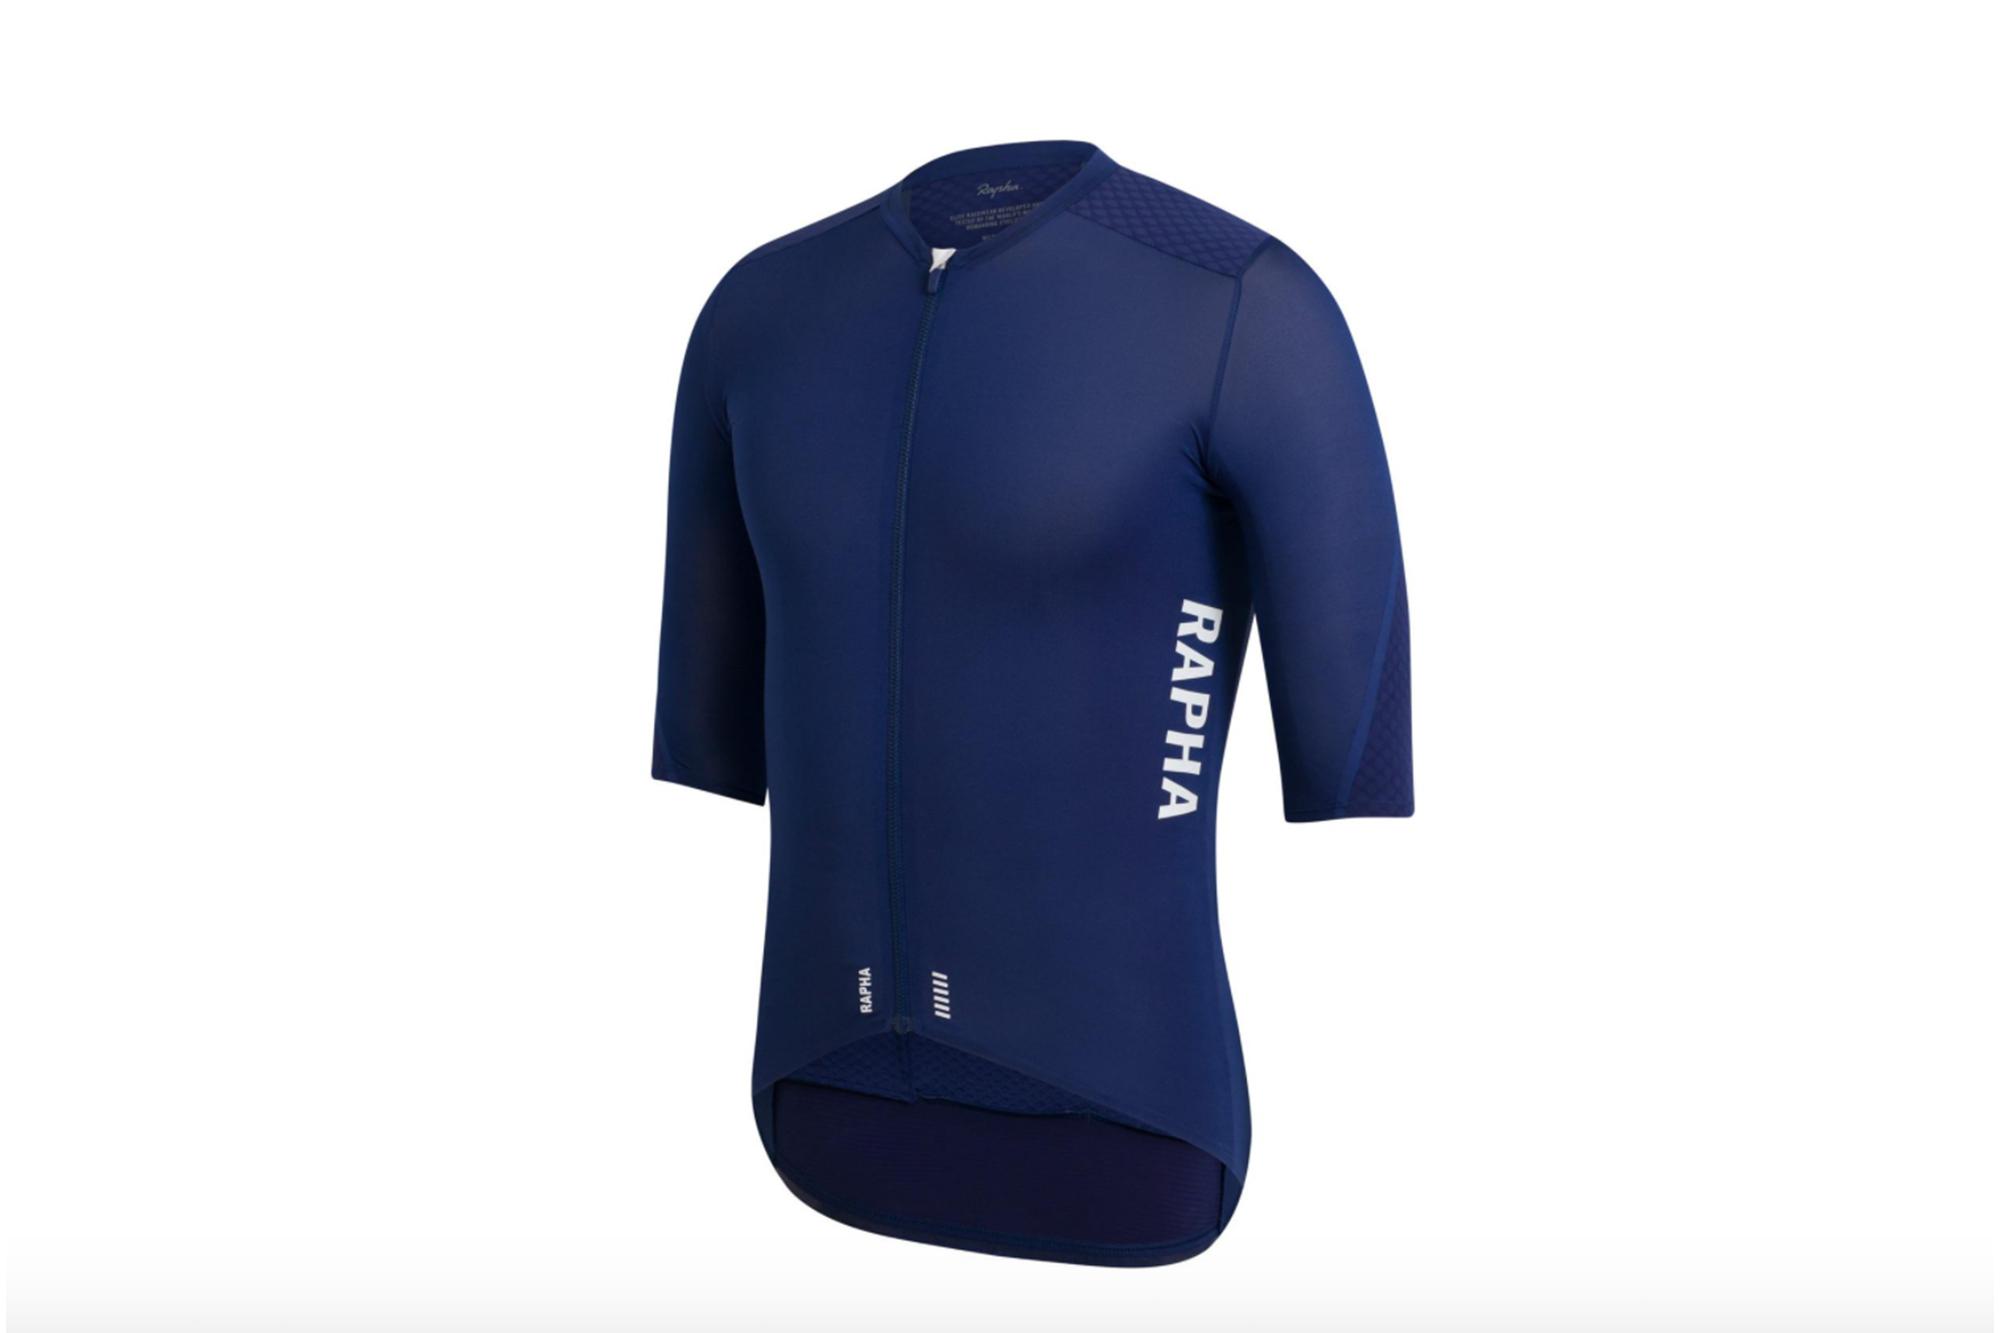 Rapha Pro Team Aero jersey review